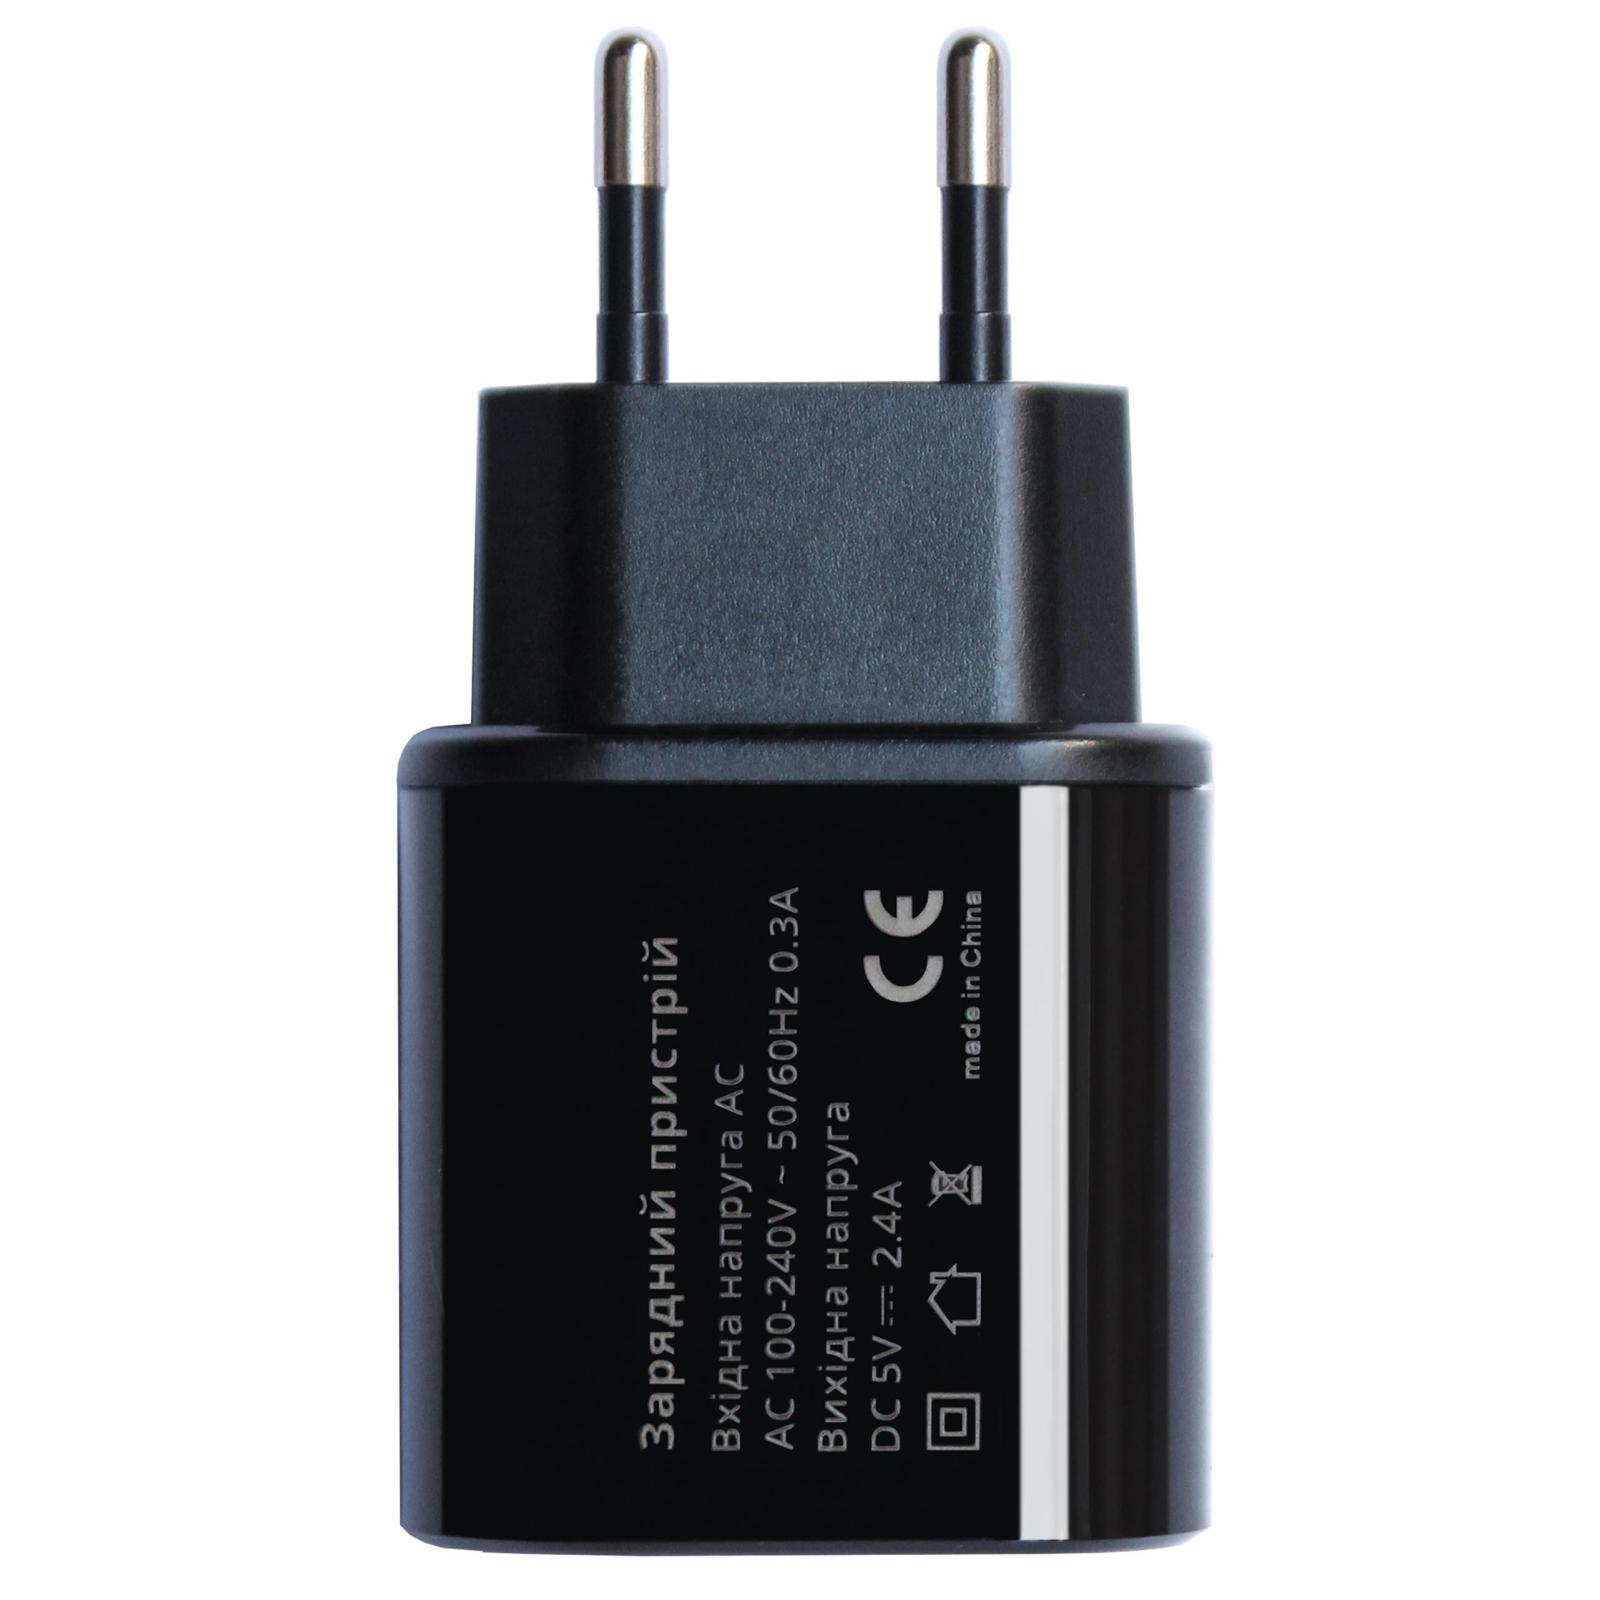 Зарядное устройство Grand-X 5V 2,4A 1*USB (CH-55B) изображение 2